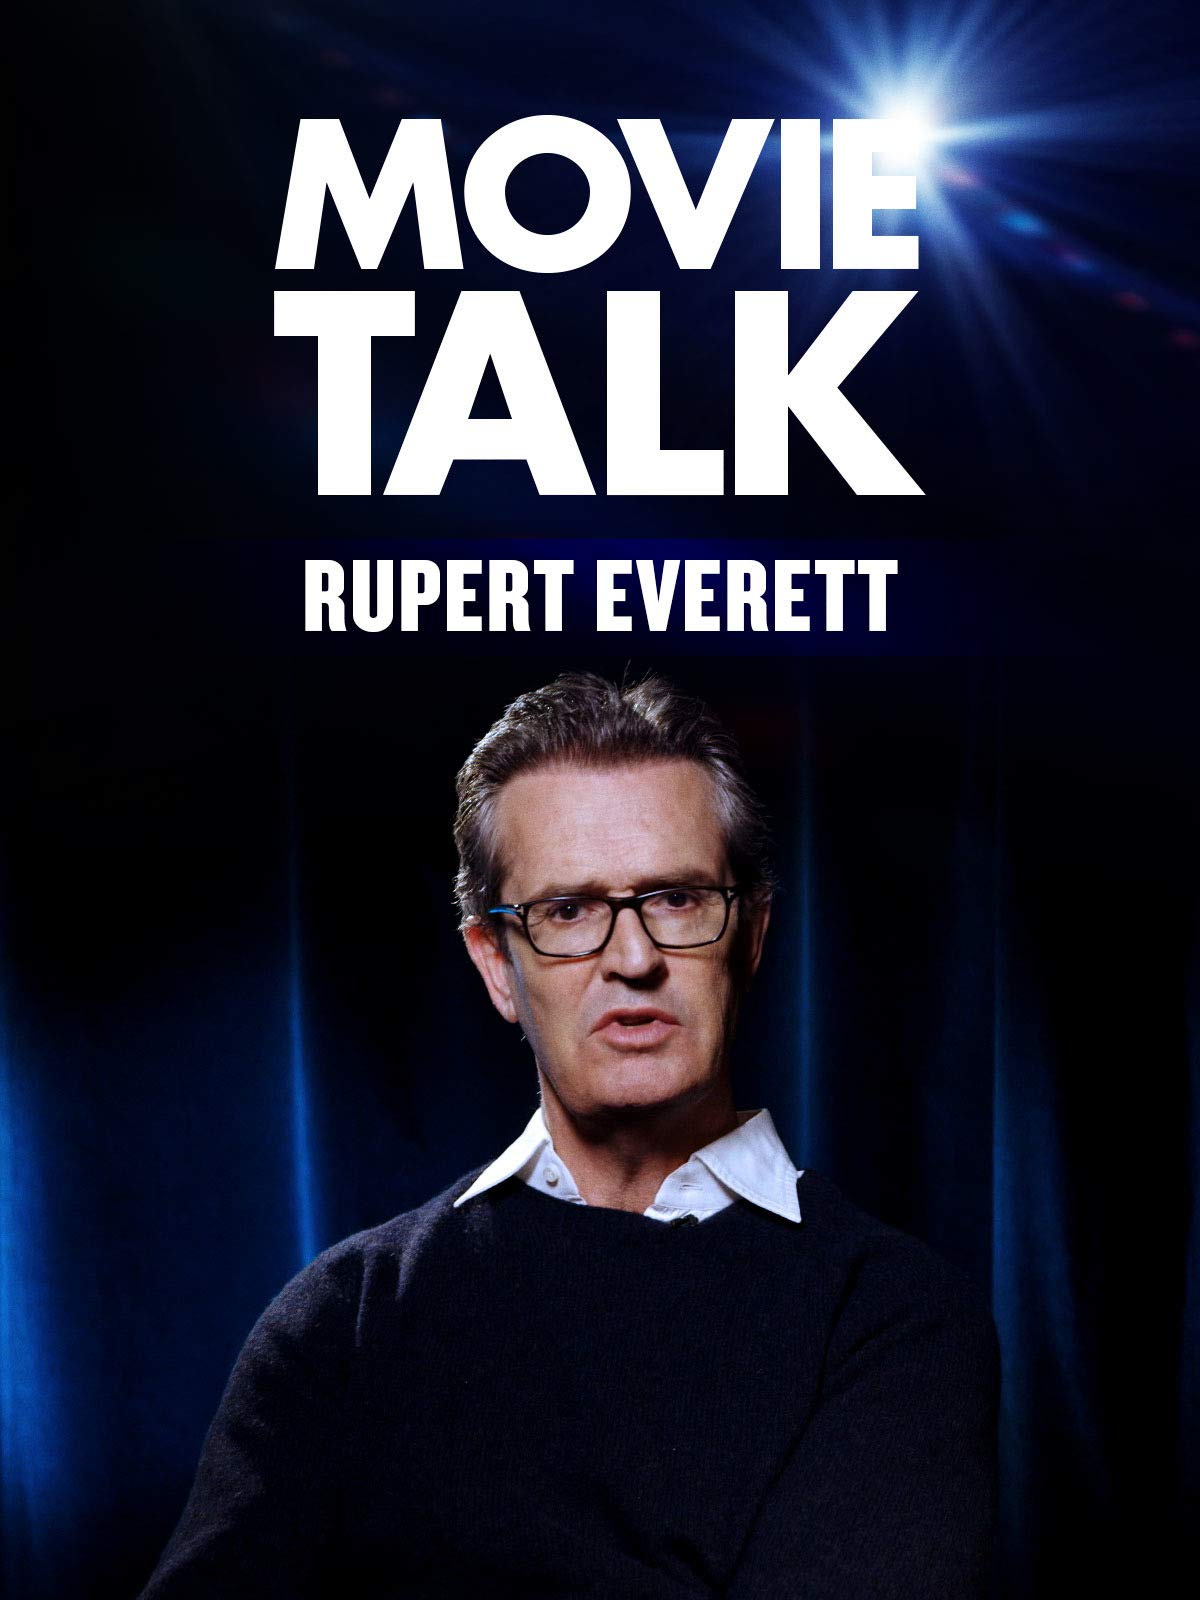 Rupert Everett - Movie Talk on Amazon Prime Video UK